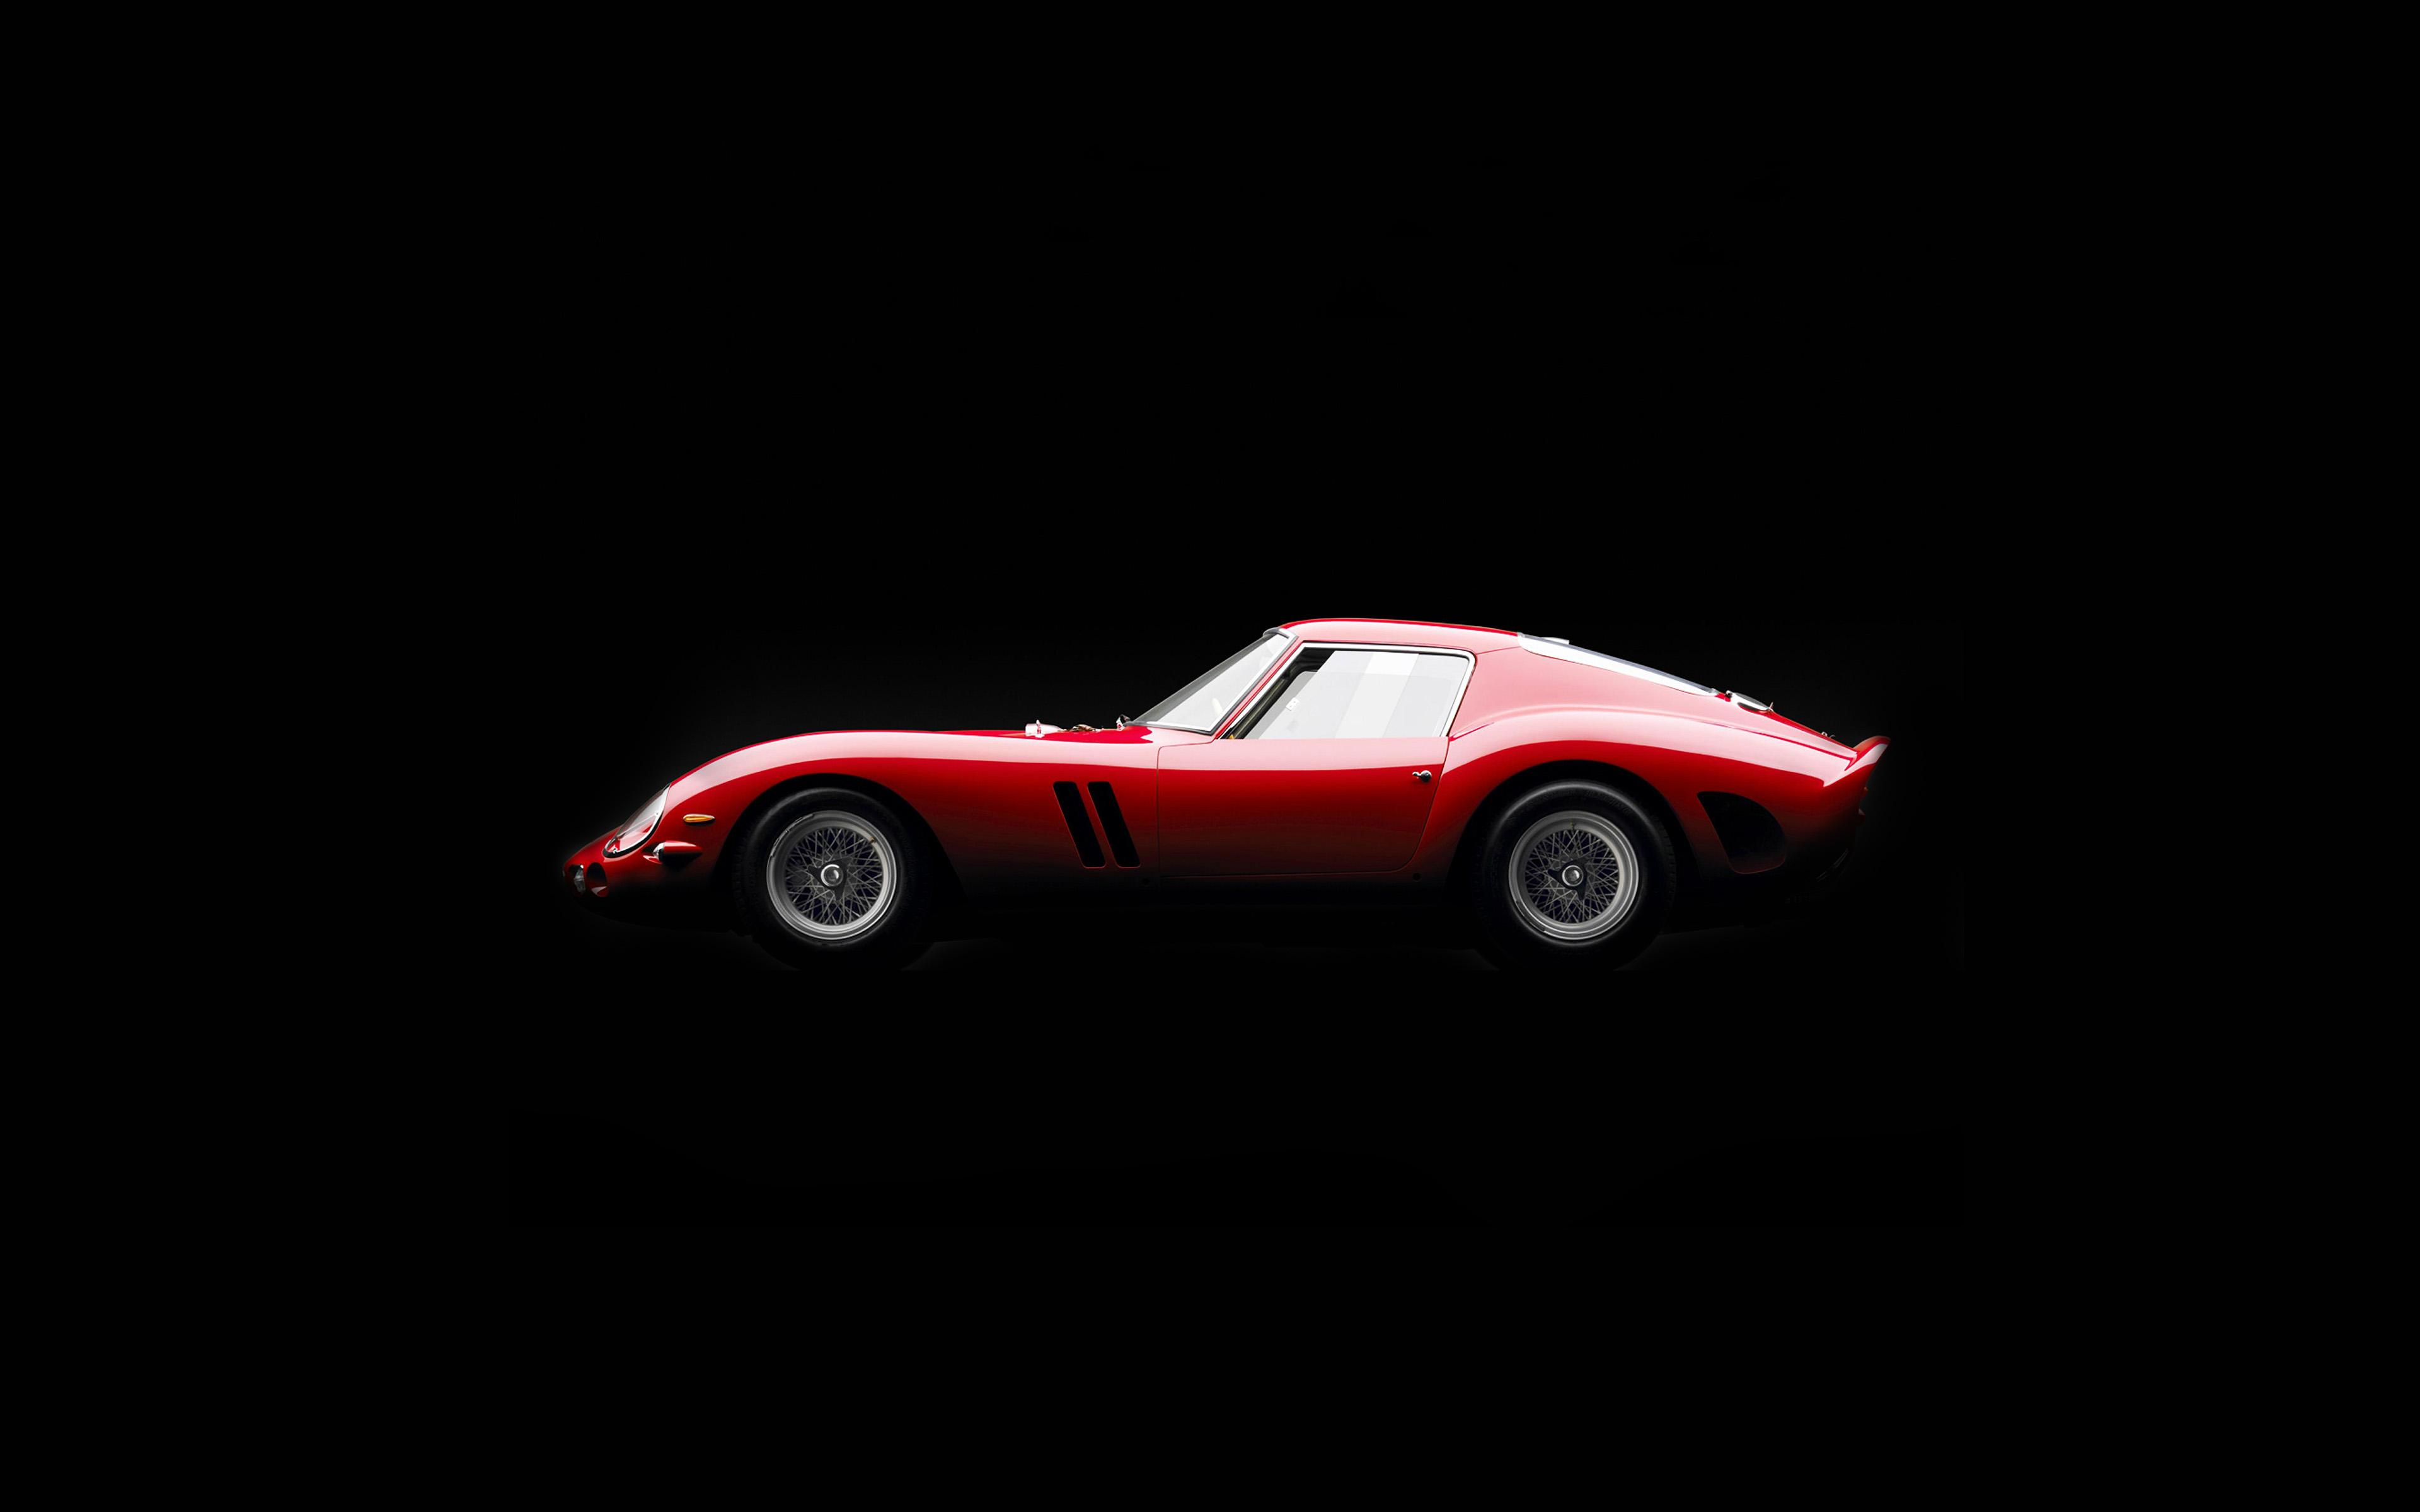 Ferrari 250 Gto Wallpapers: Wallpaper For Desktop, Laptop